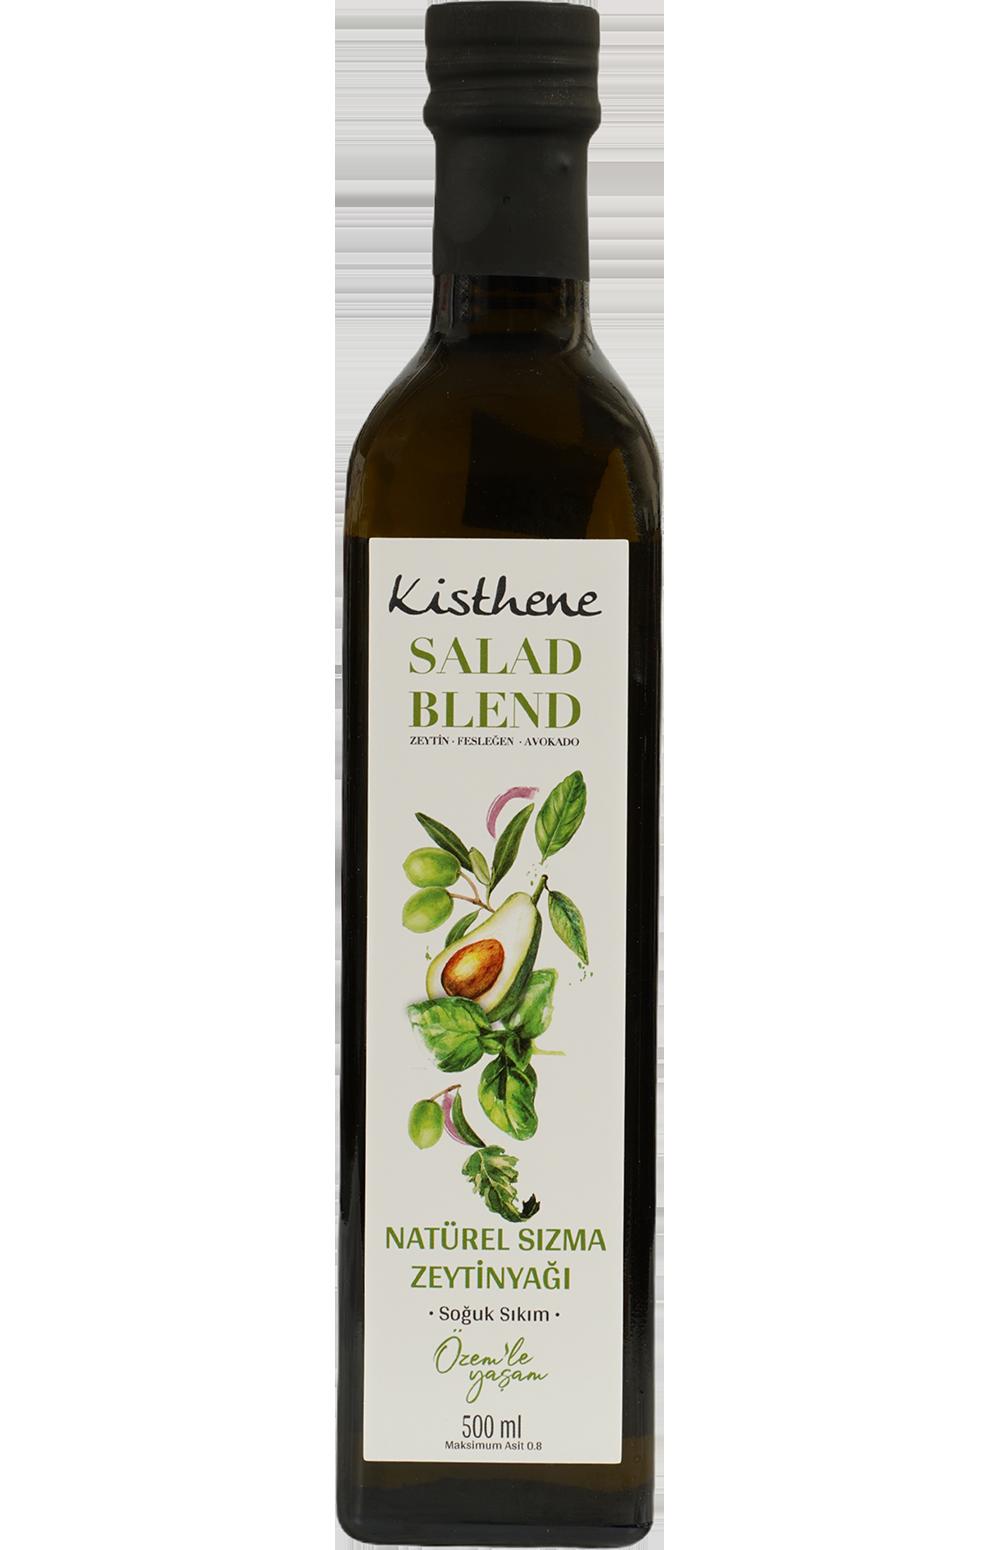 Kisthene Salad Blend